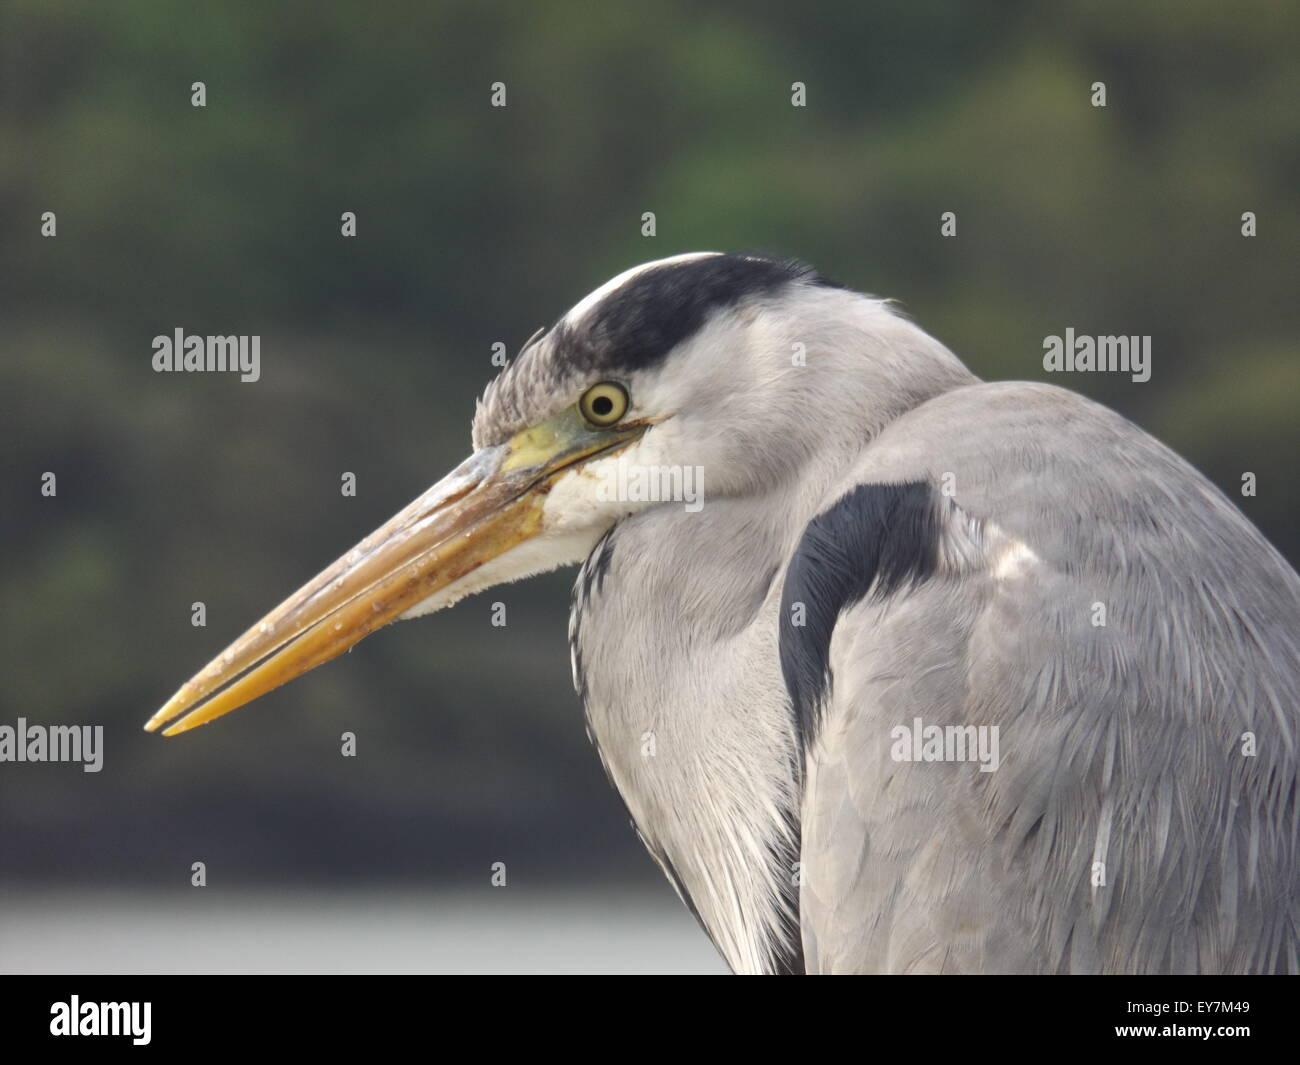 Heron of Union Hall - Stock Image